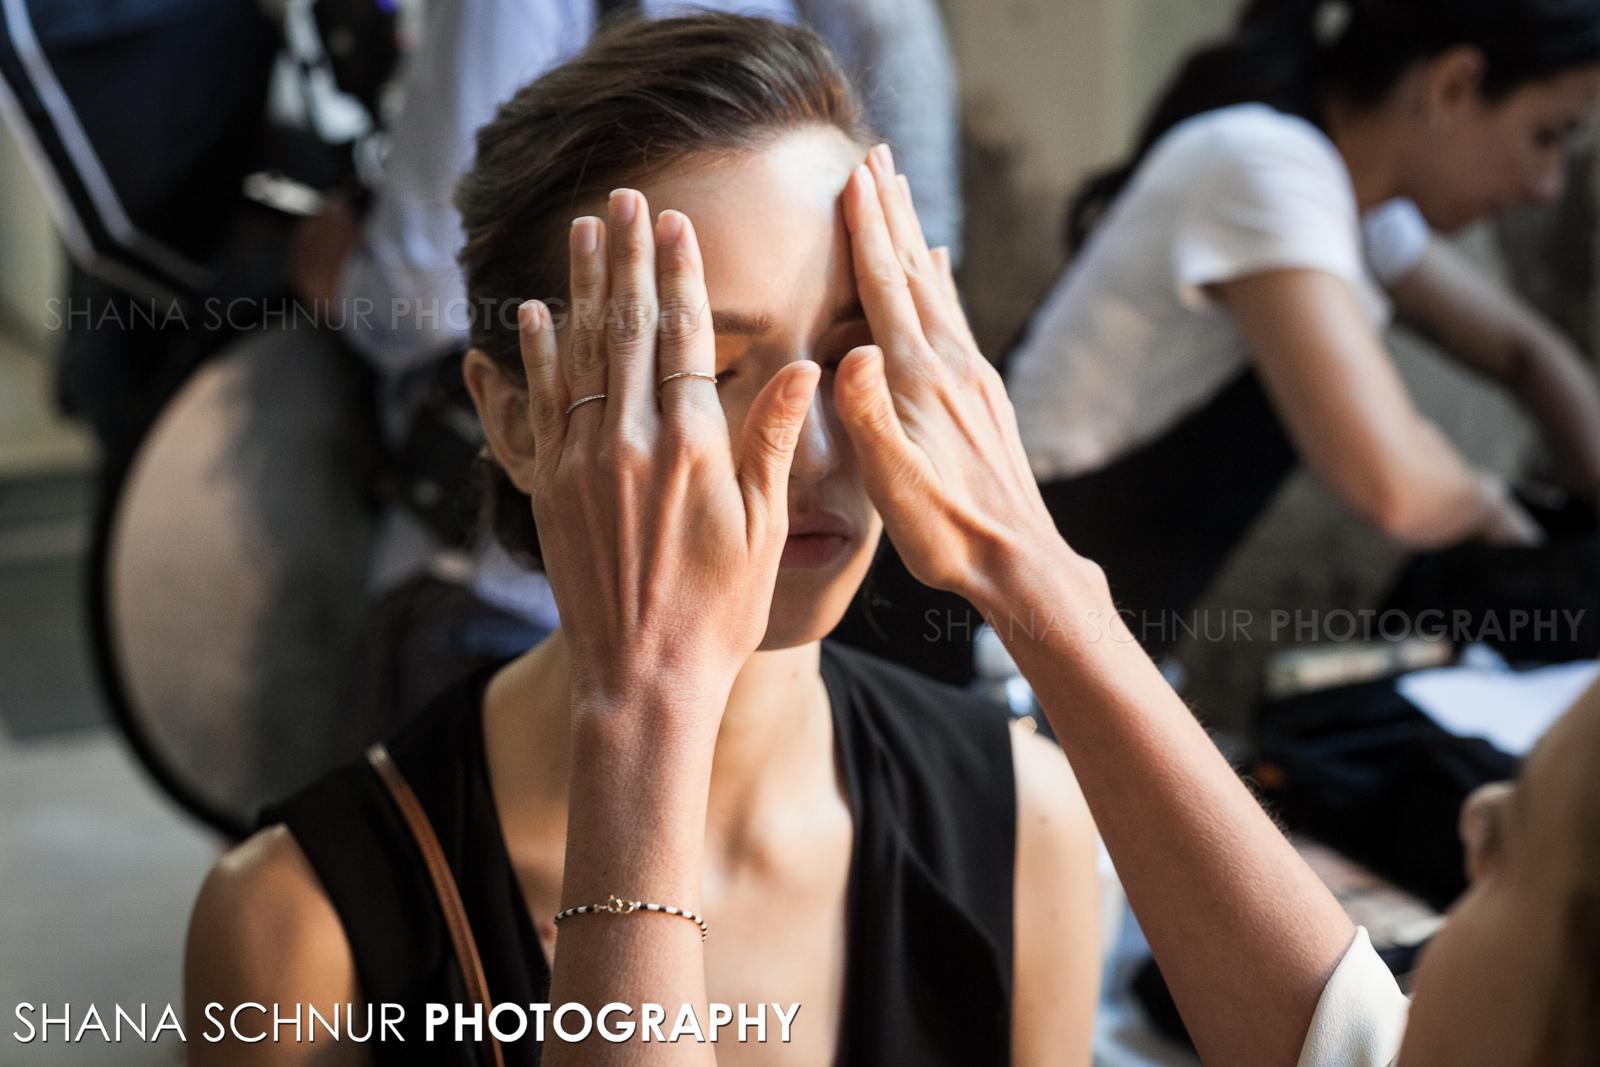 JMendel-Shana-Schnur-Photography--015.jpg